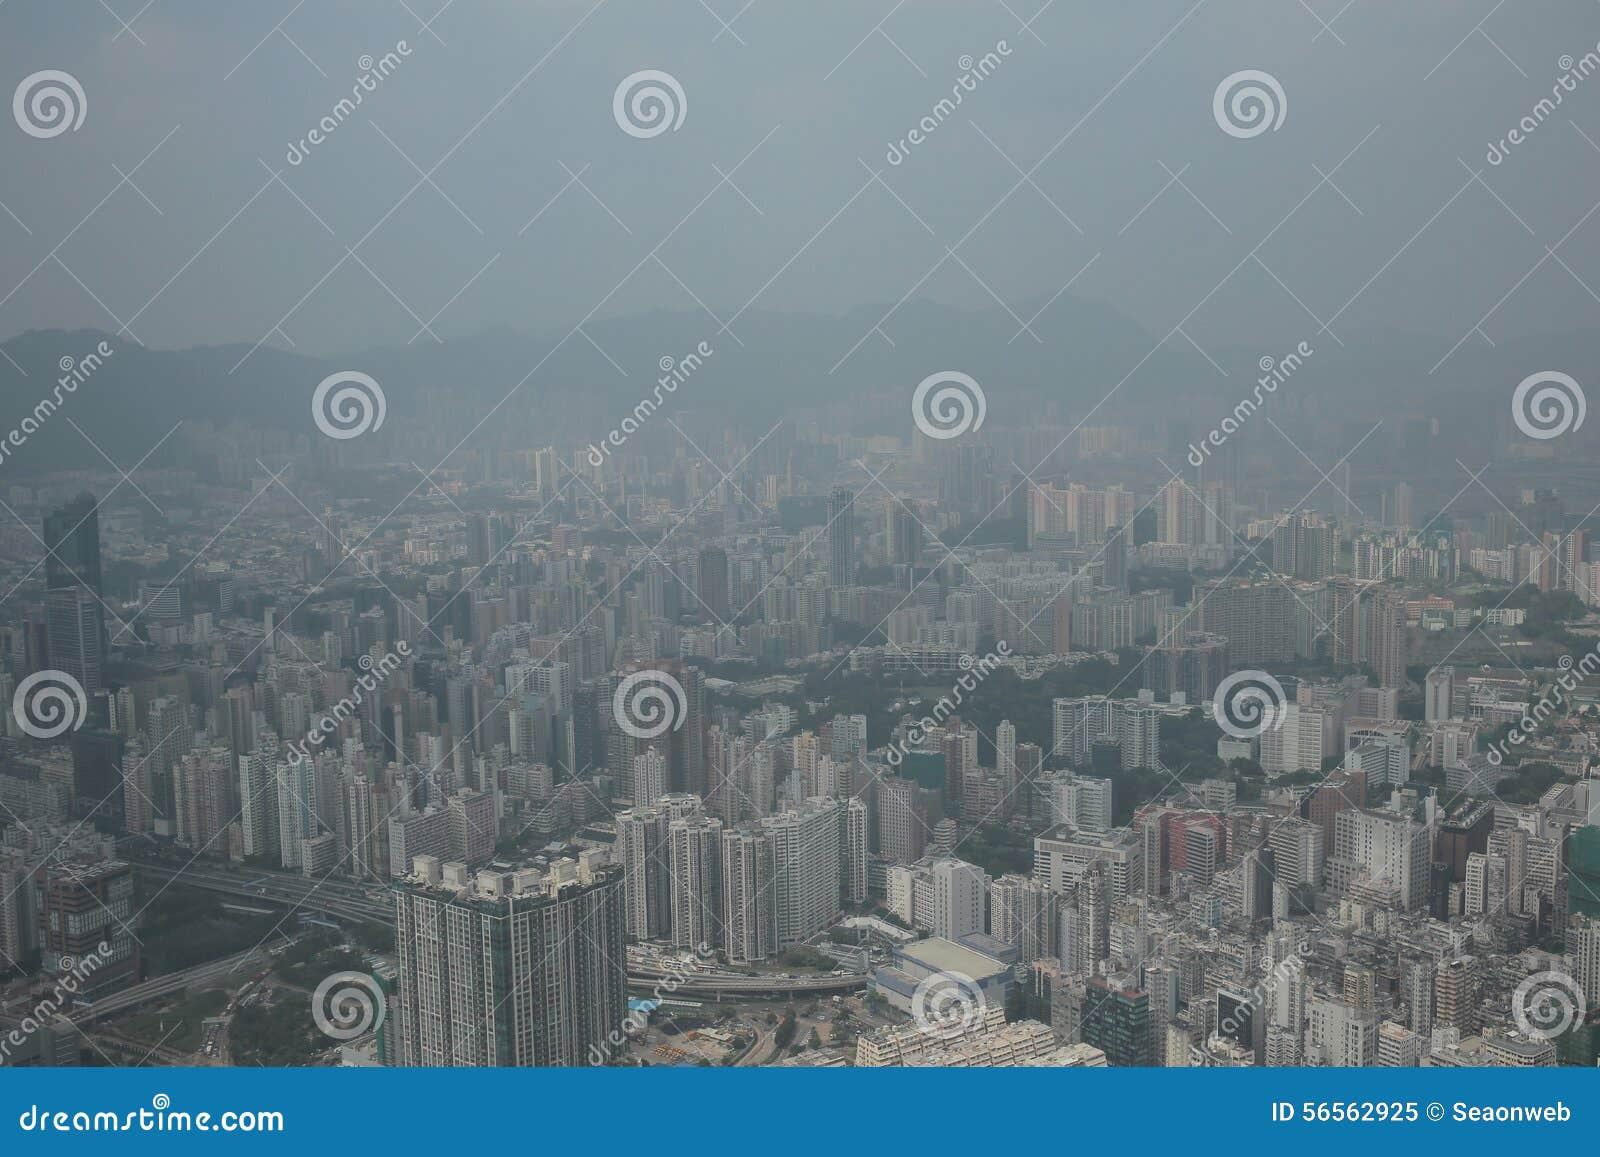 Download Άποψη Kowloon από το διεθνή κεντρικό ουρανοξύστη εμπορίου - Στοκ Εικόνα - εικόνα από νεφελώδης, γυαλί: 56562925